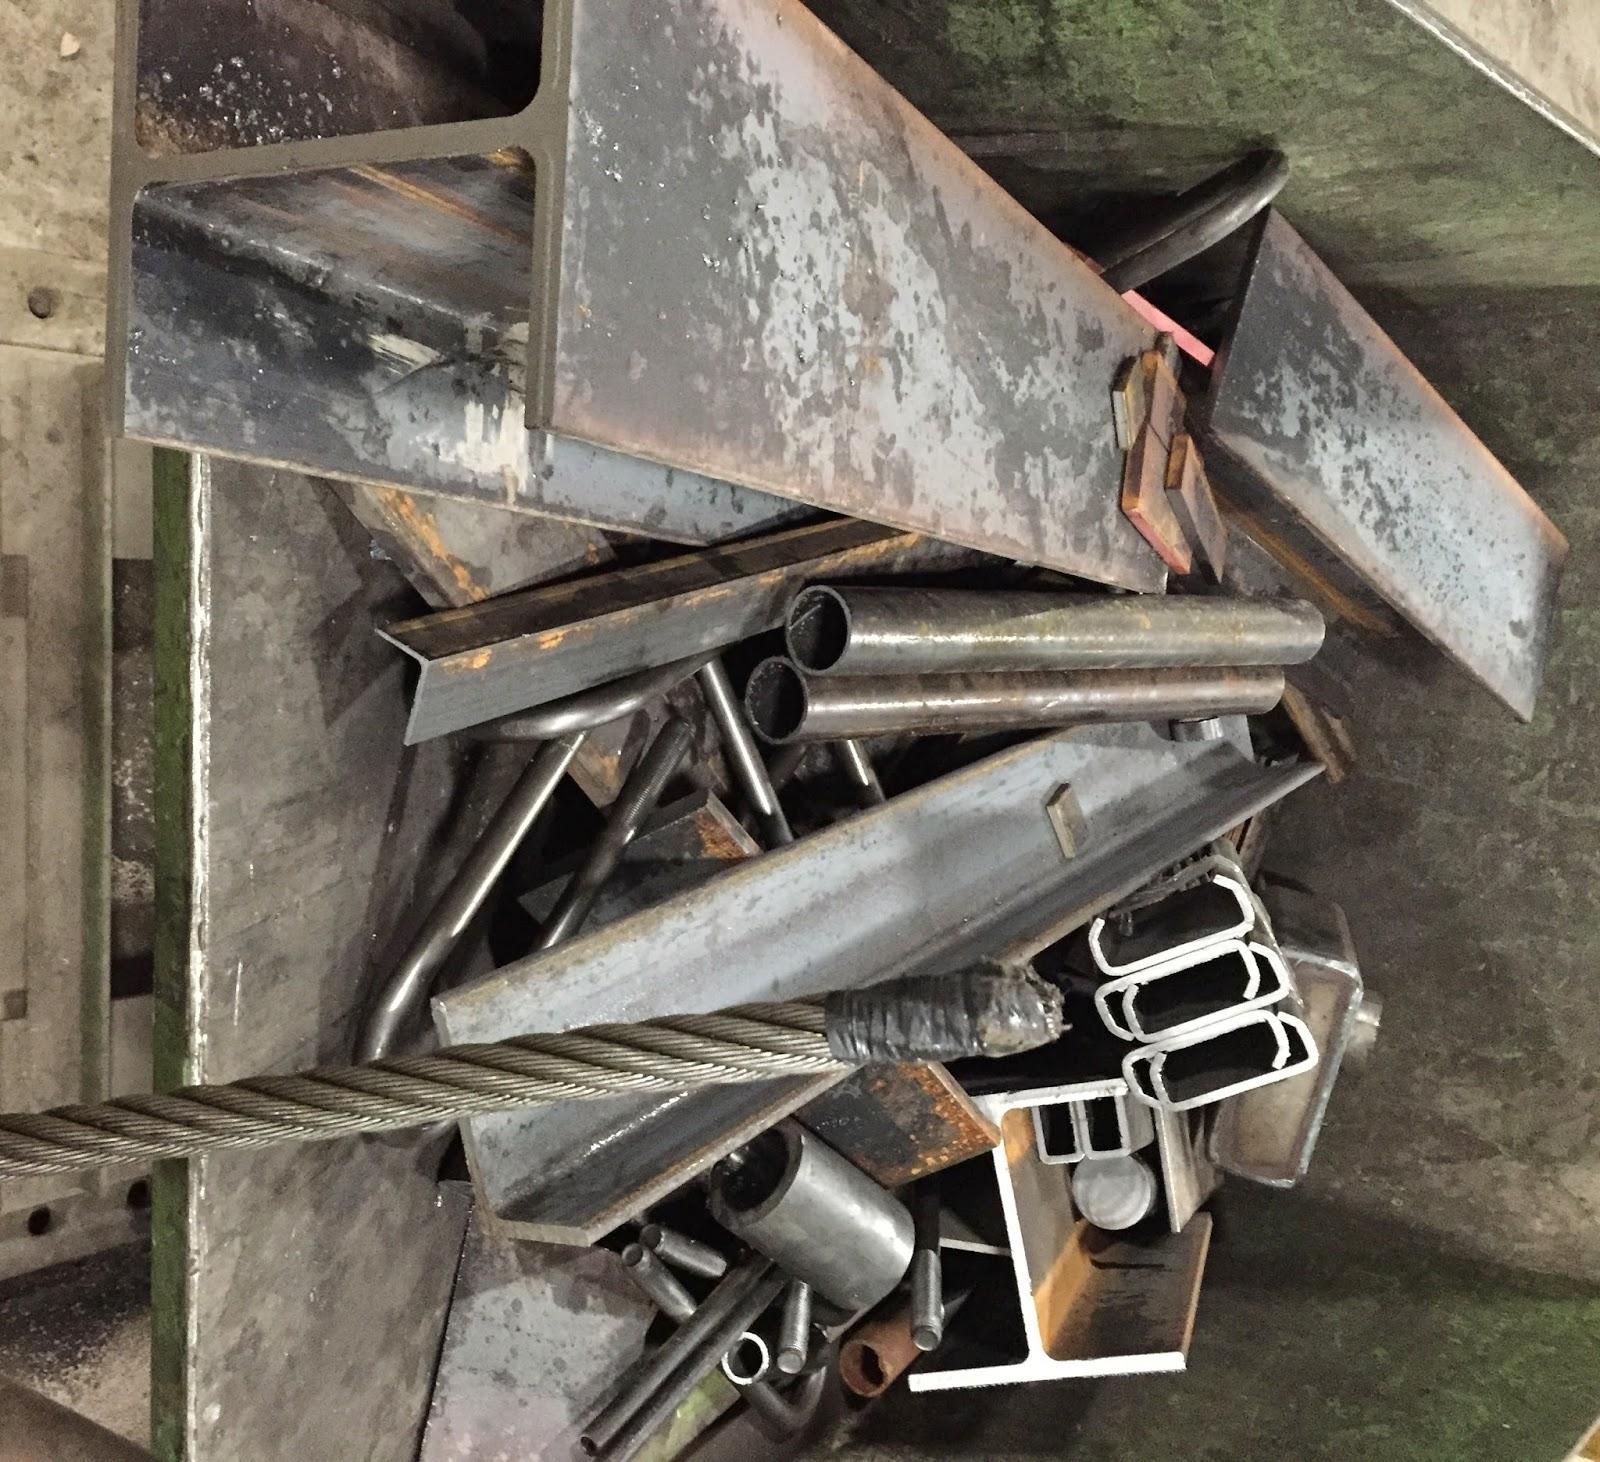 Factory Metal Waste Goldsboro Metal Recycling. 801 N John St, Goldsboro, NC, 27530, (919) 731-5600